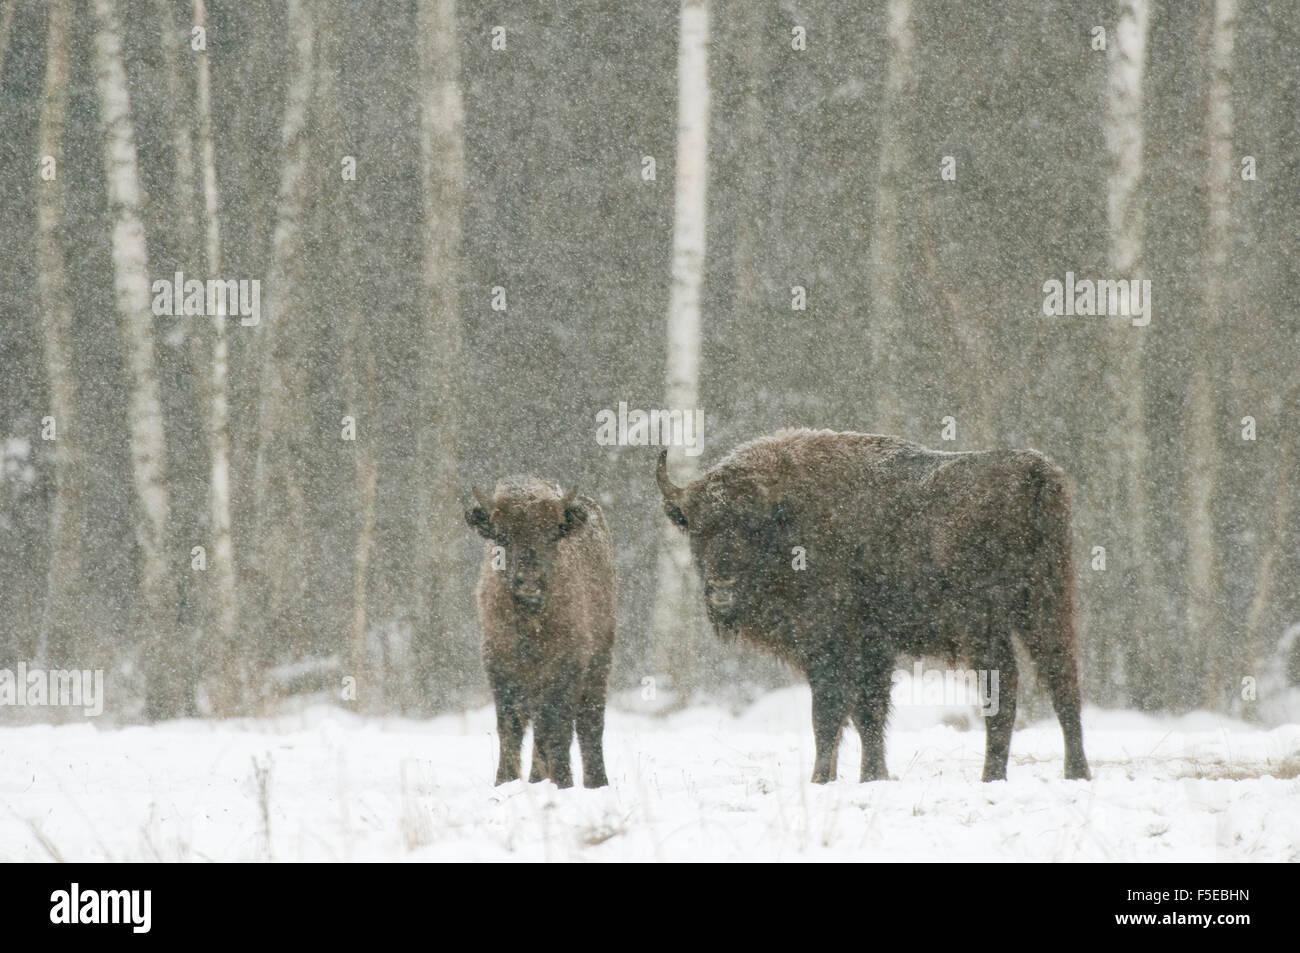 European bison (Bison bonasus) female with calf, Bialowieza National Park, Podlaskie Voivodeship, Poland - Stock Image